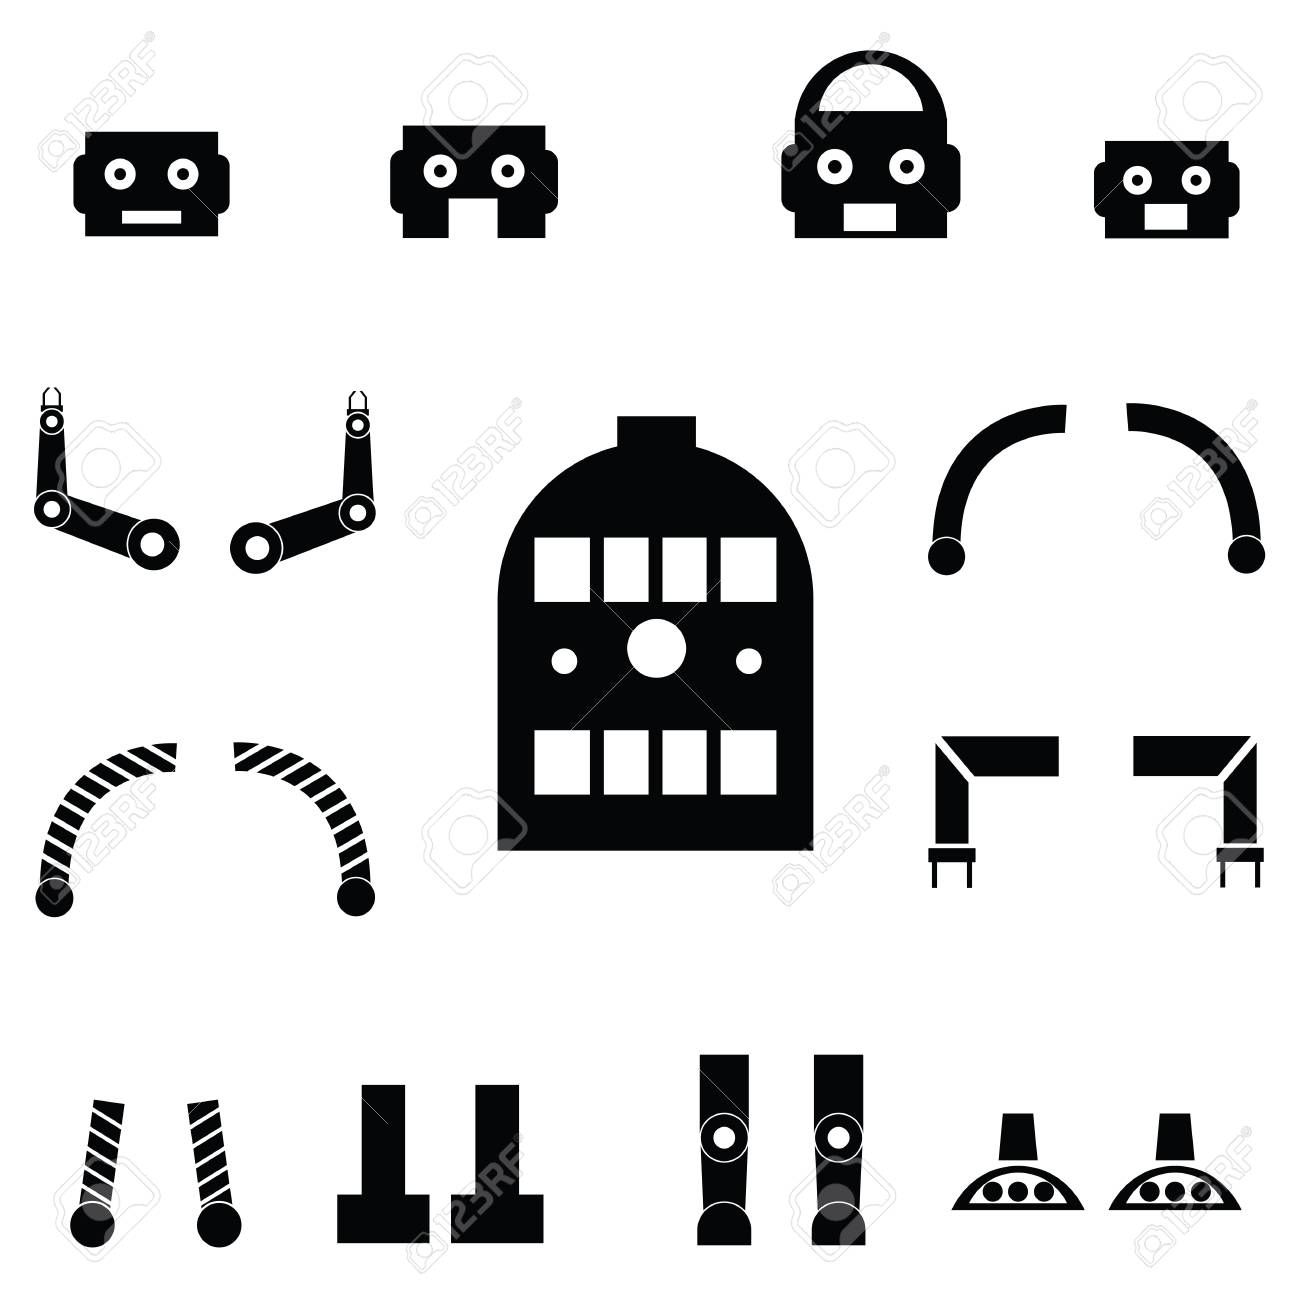 Robot parts icon set